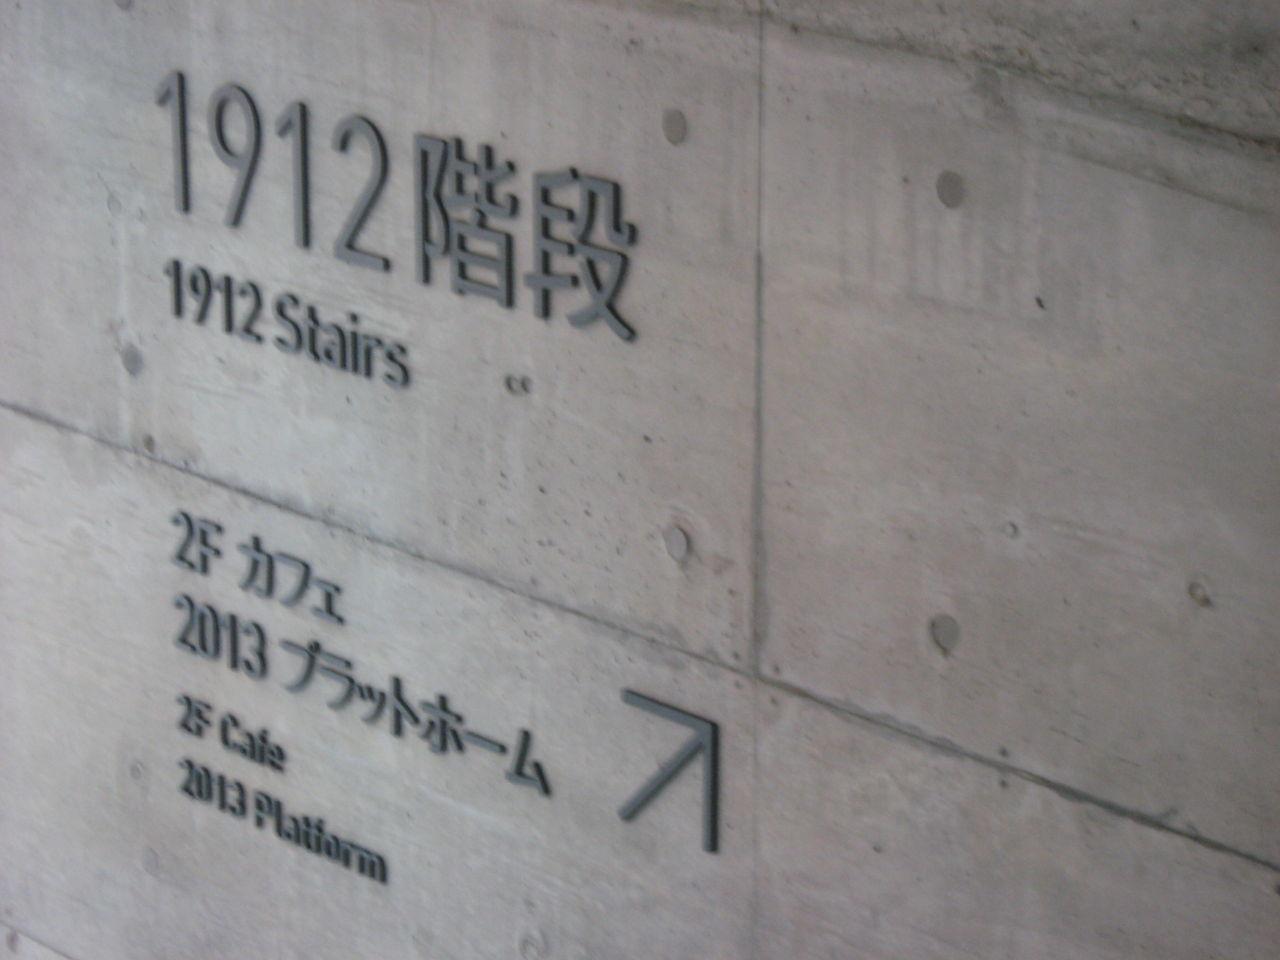 SKE48とエアバスA380超絶推し男のblog  昔の名前で出ています~mAAch ecute 神田万世橋(中央線万世橋駅&交通博物館跡)を訪問して来ました(後編)コメントトラックバック                ske380_800